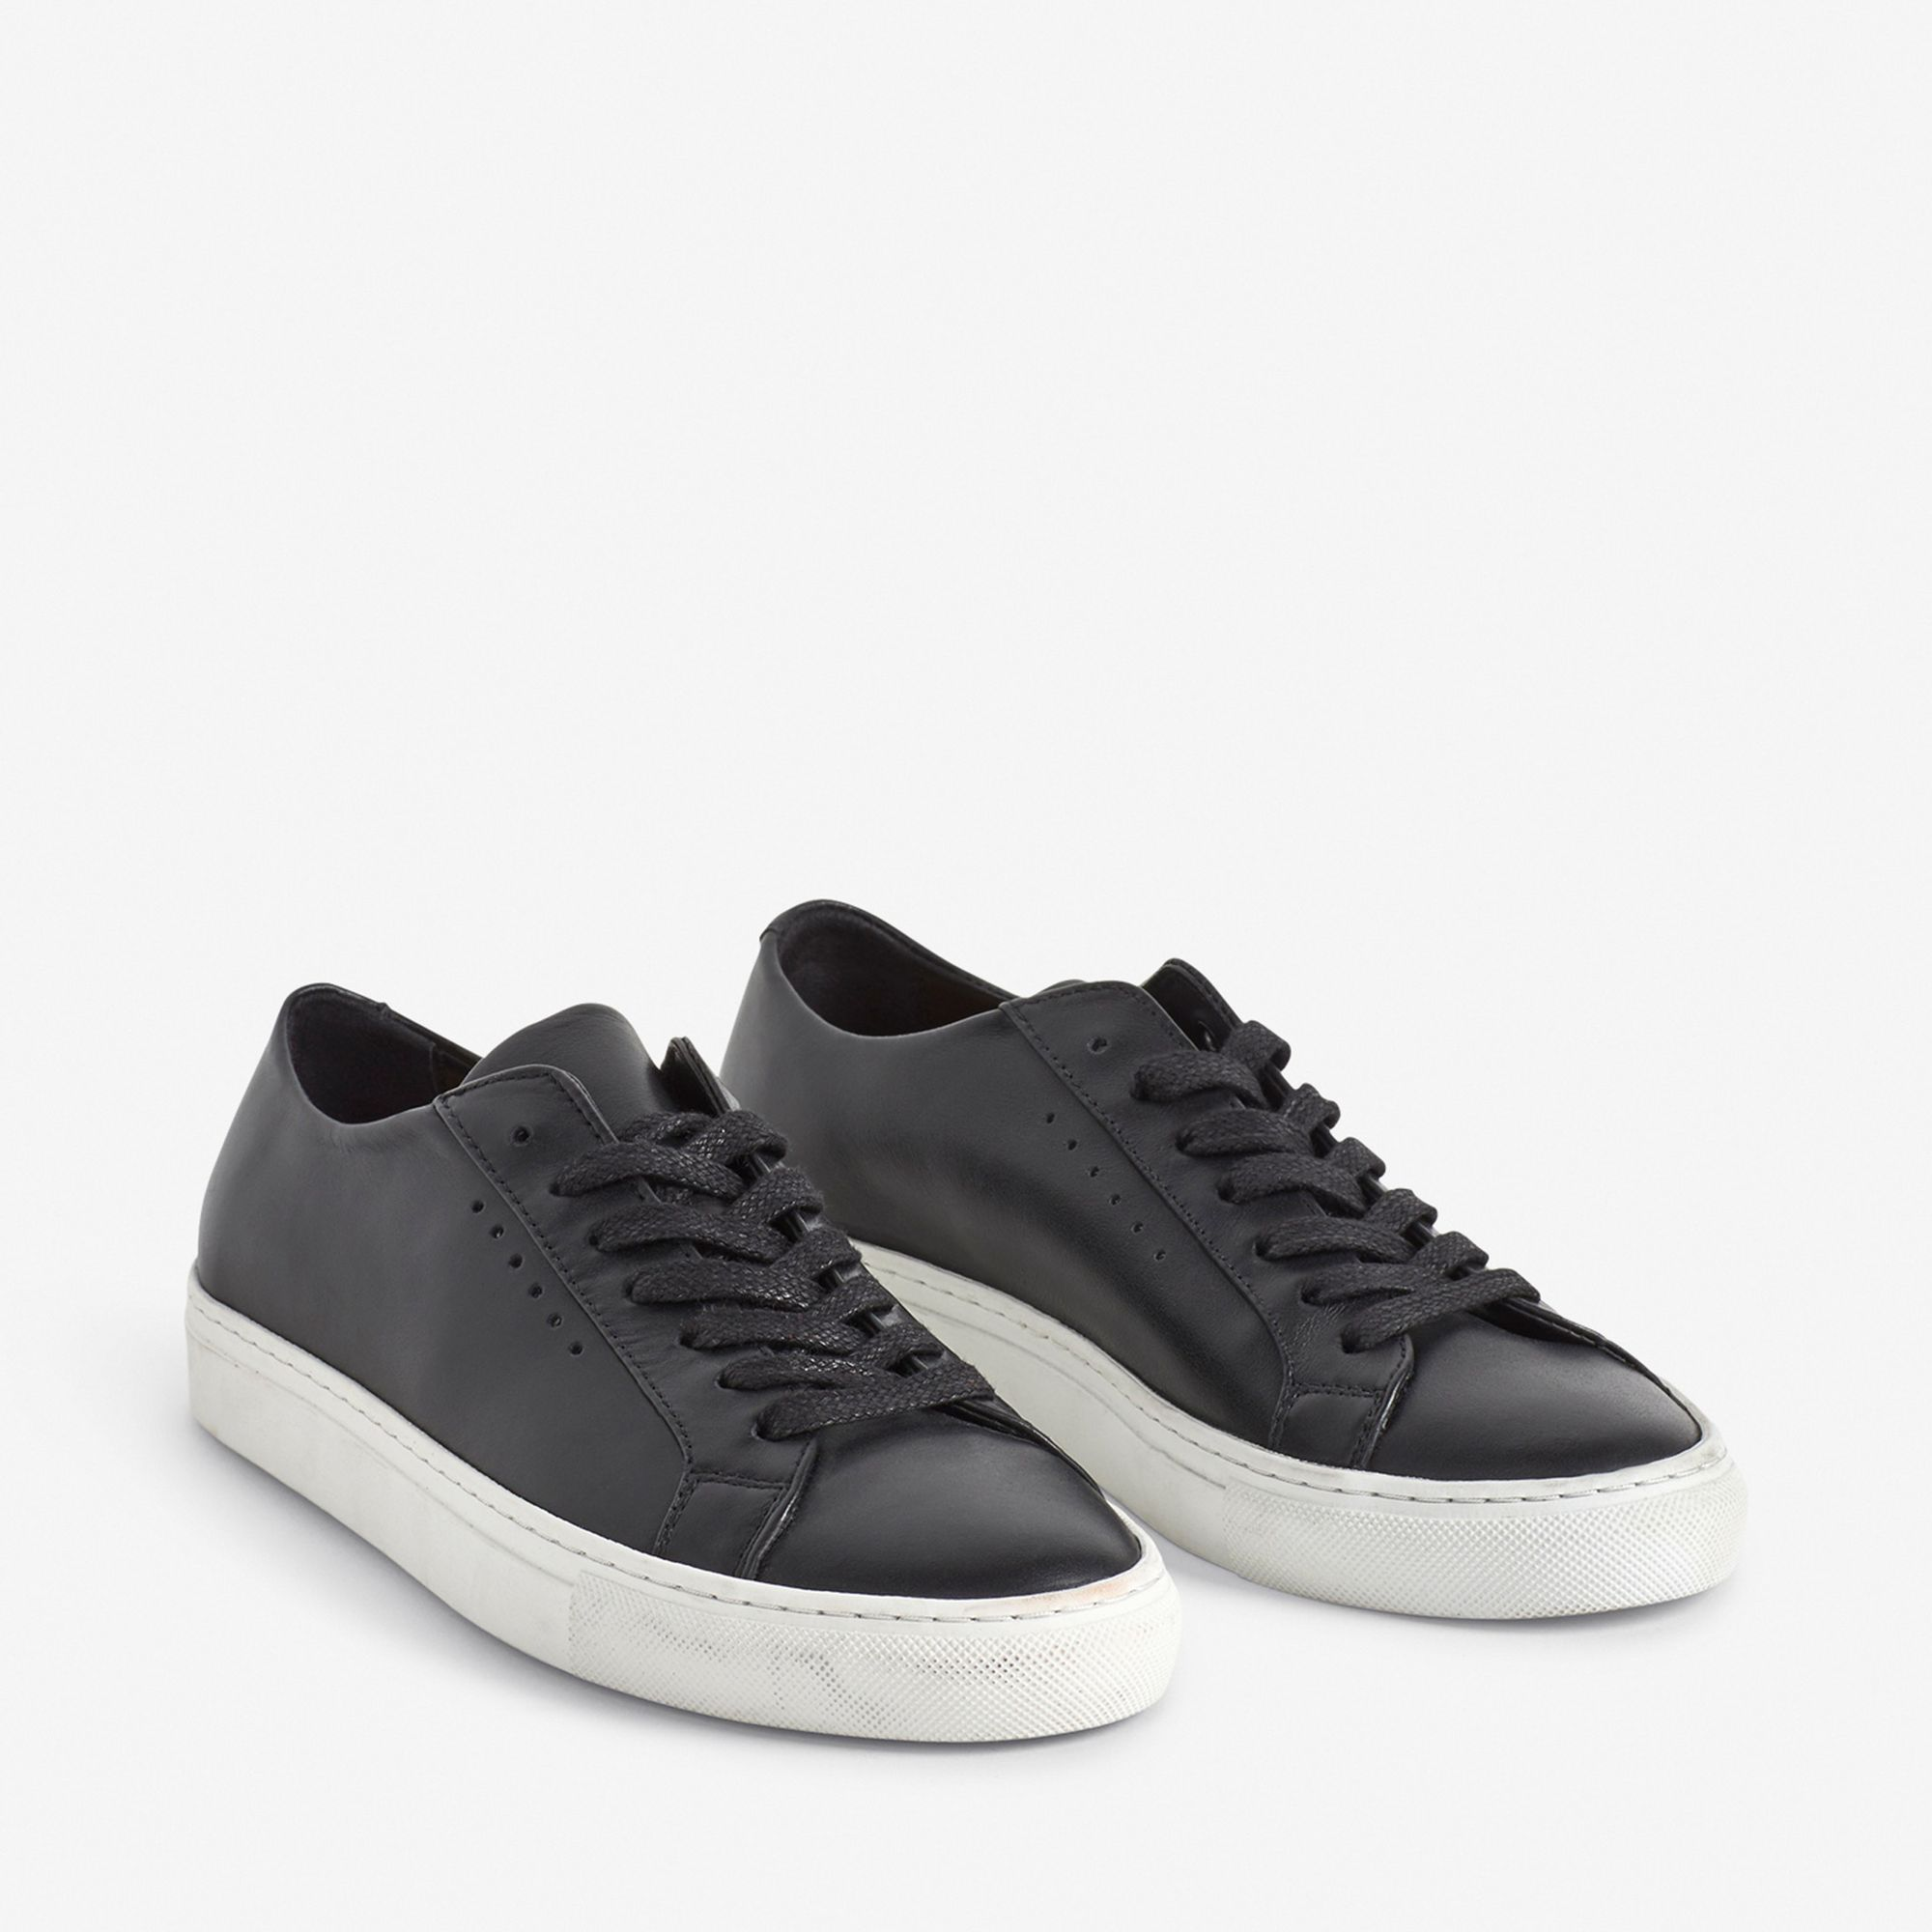 Filippa K Kate Low Sneaker sneakers i skinn, Svart, 36